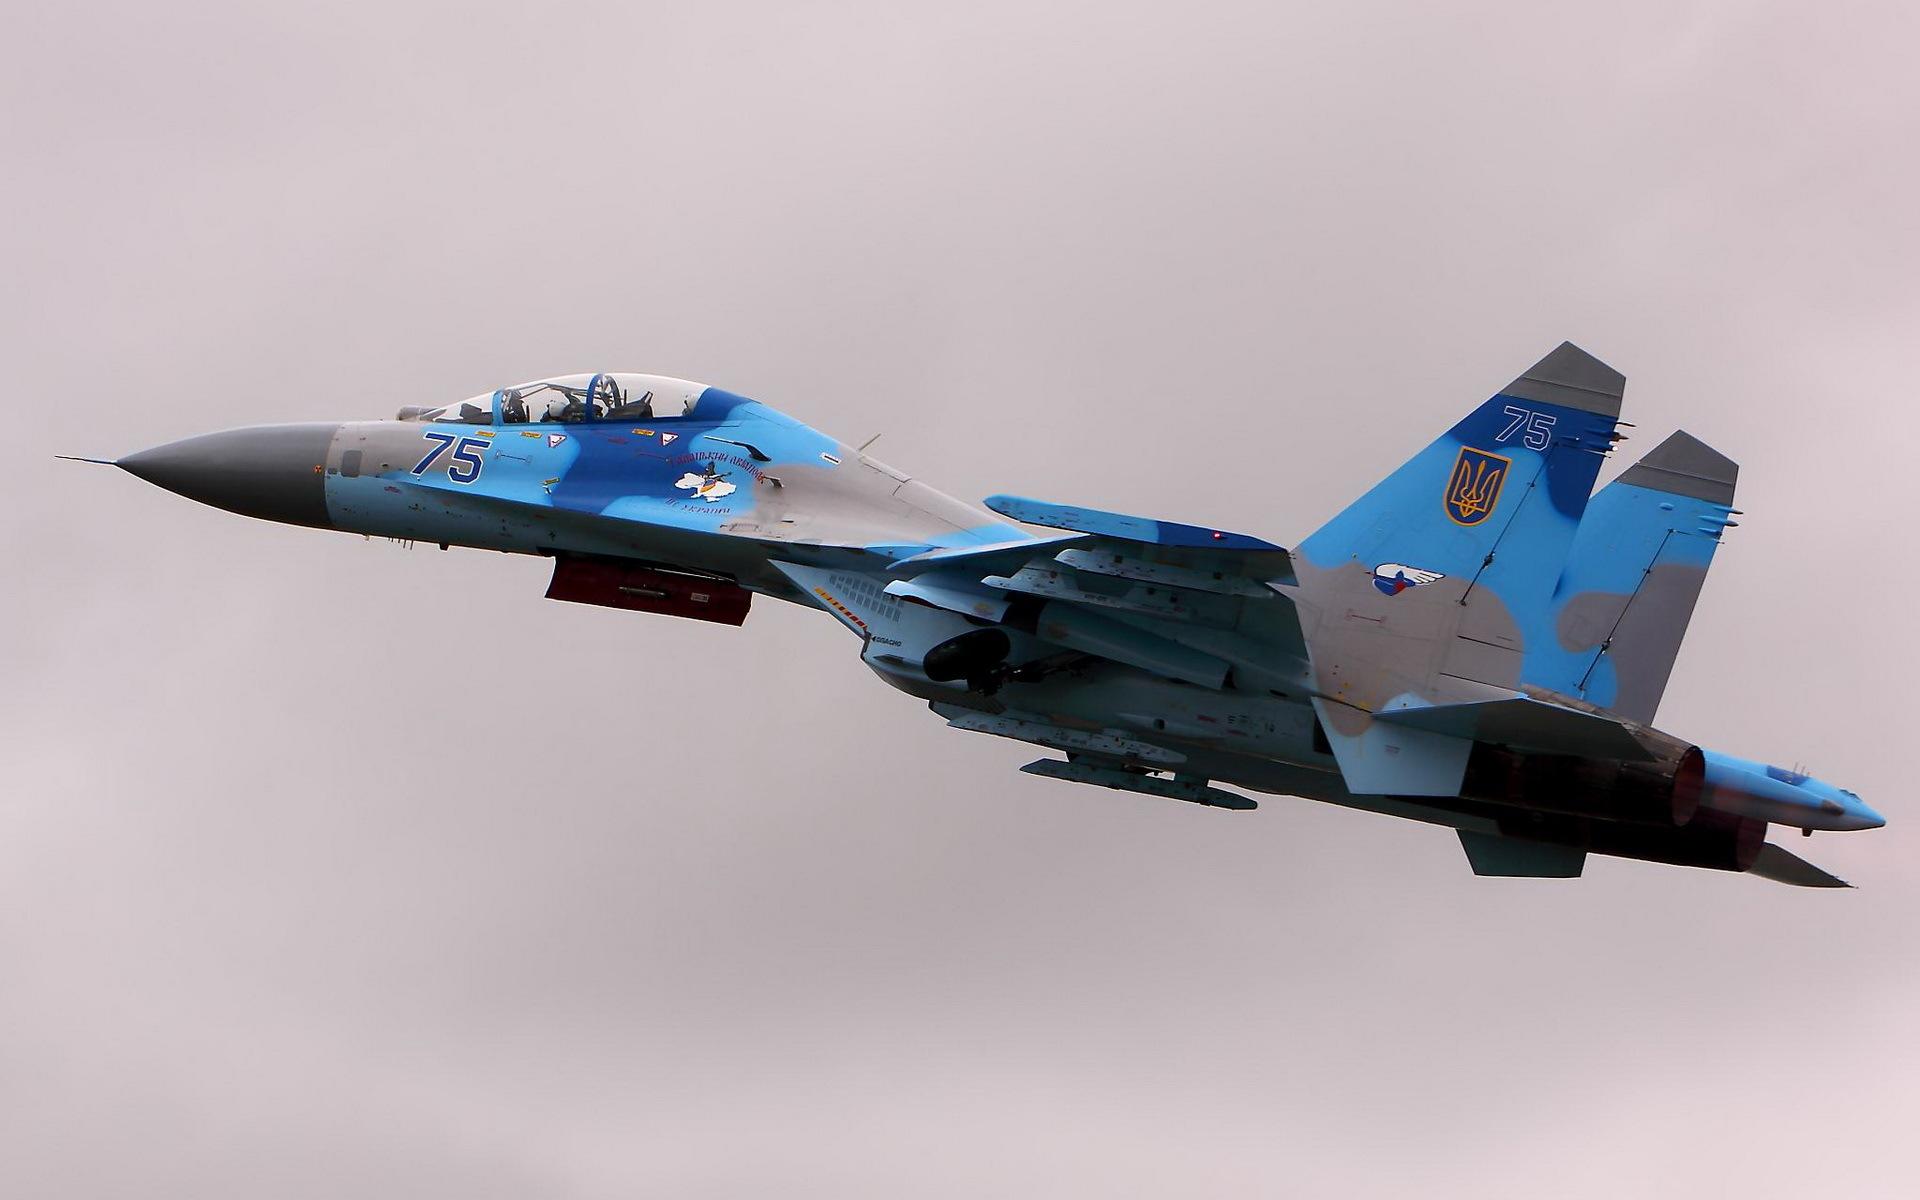 Ukrainian Air Force